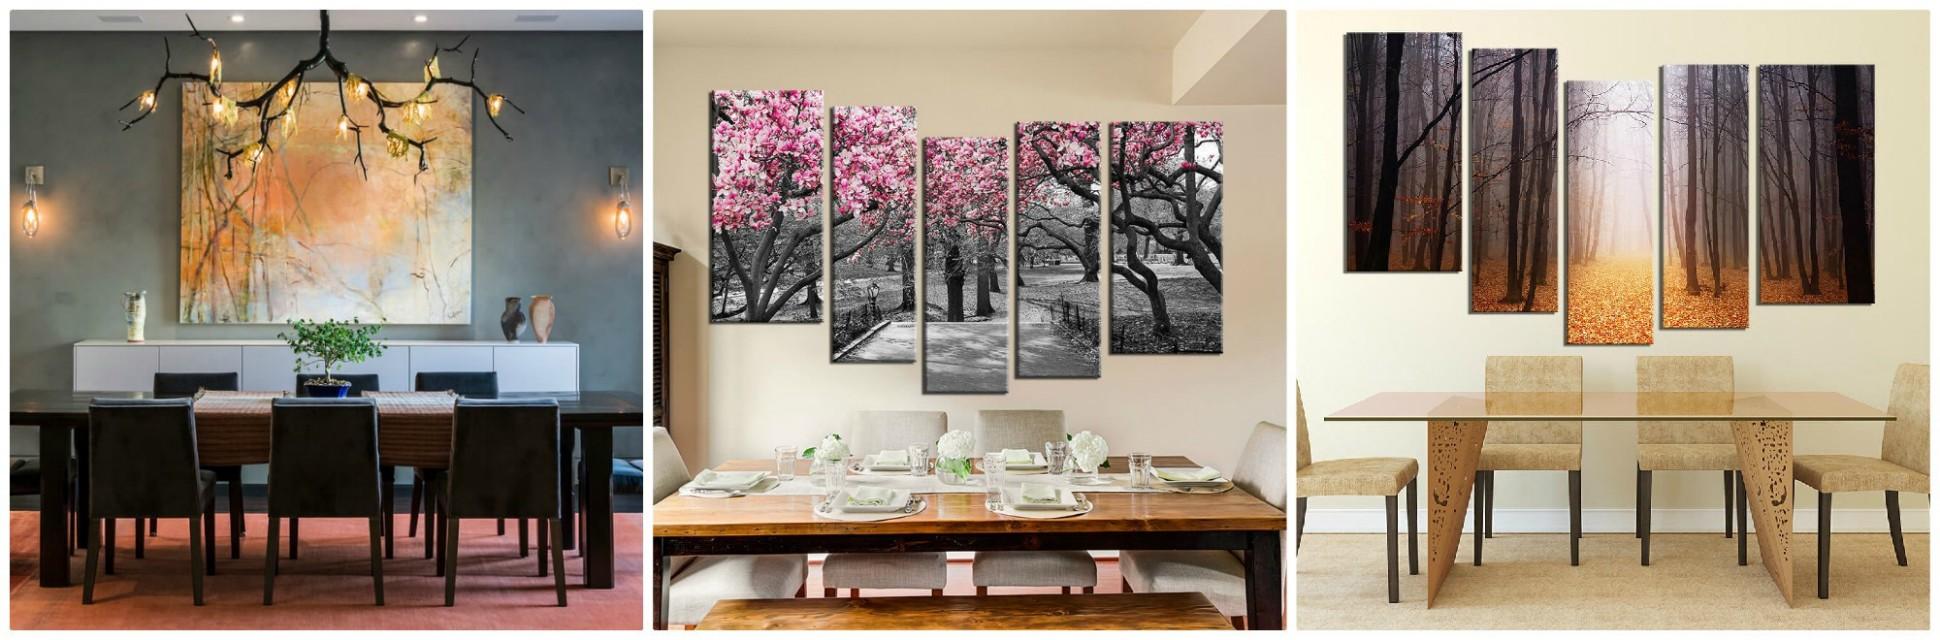 9 Beautiful Tree Wall Art Ideas To Decor Dining Room Interior  - Dining Room Artwork Ideas